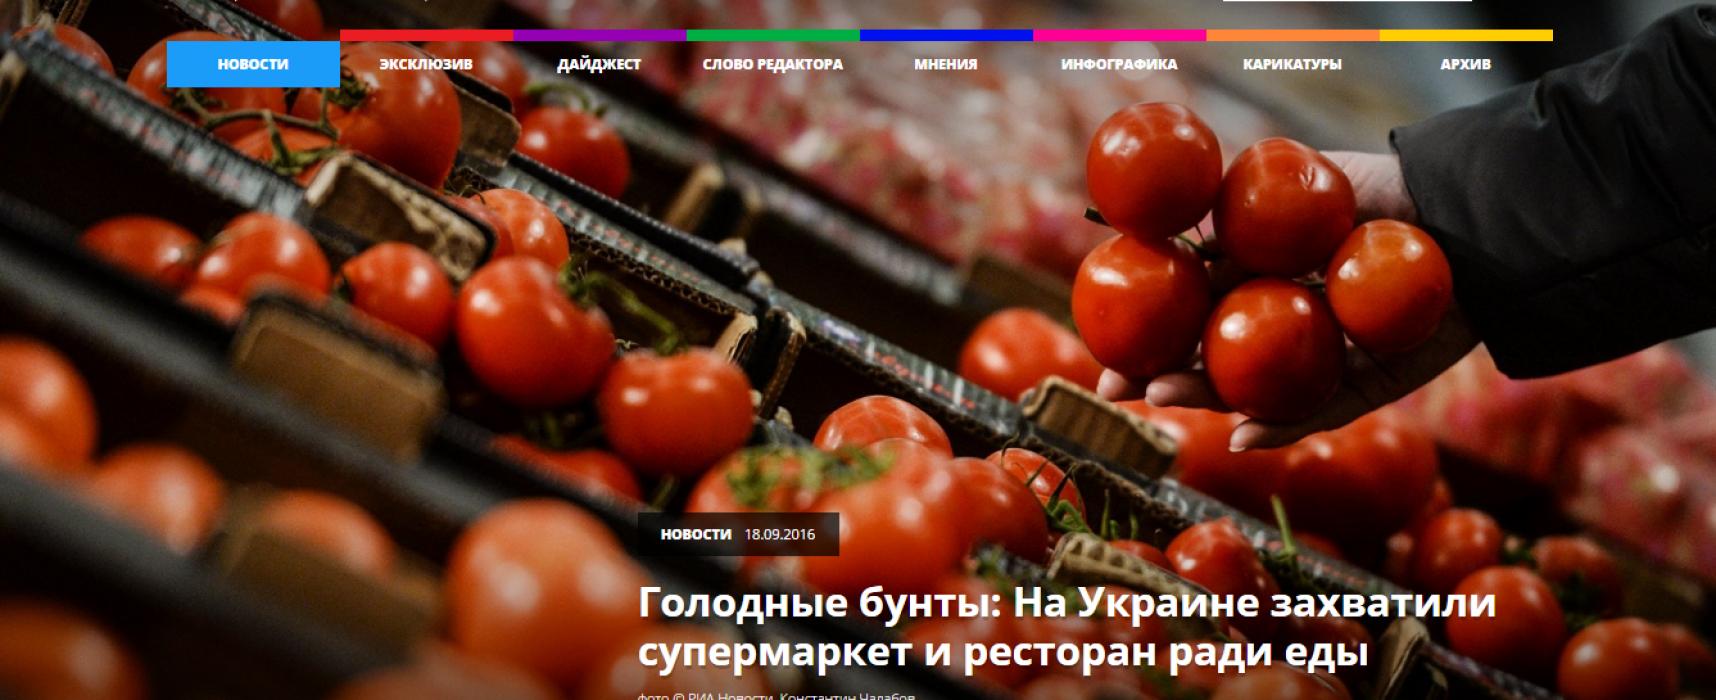 Falso: Ucrania padece disturbios por la falta de comida